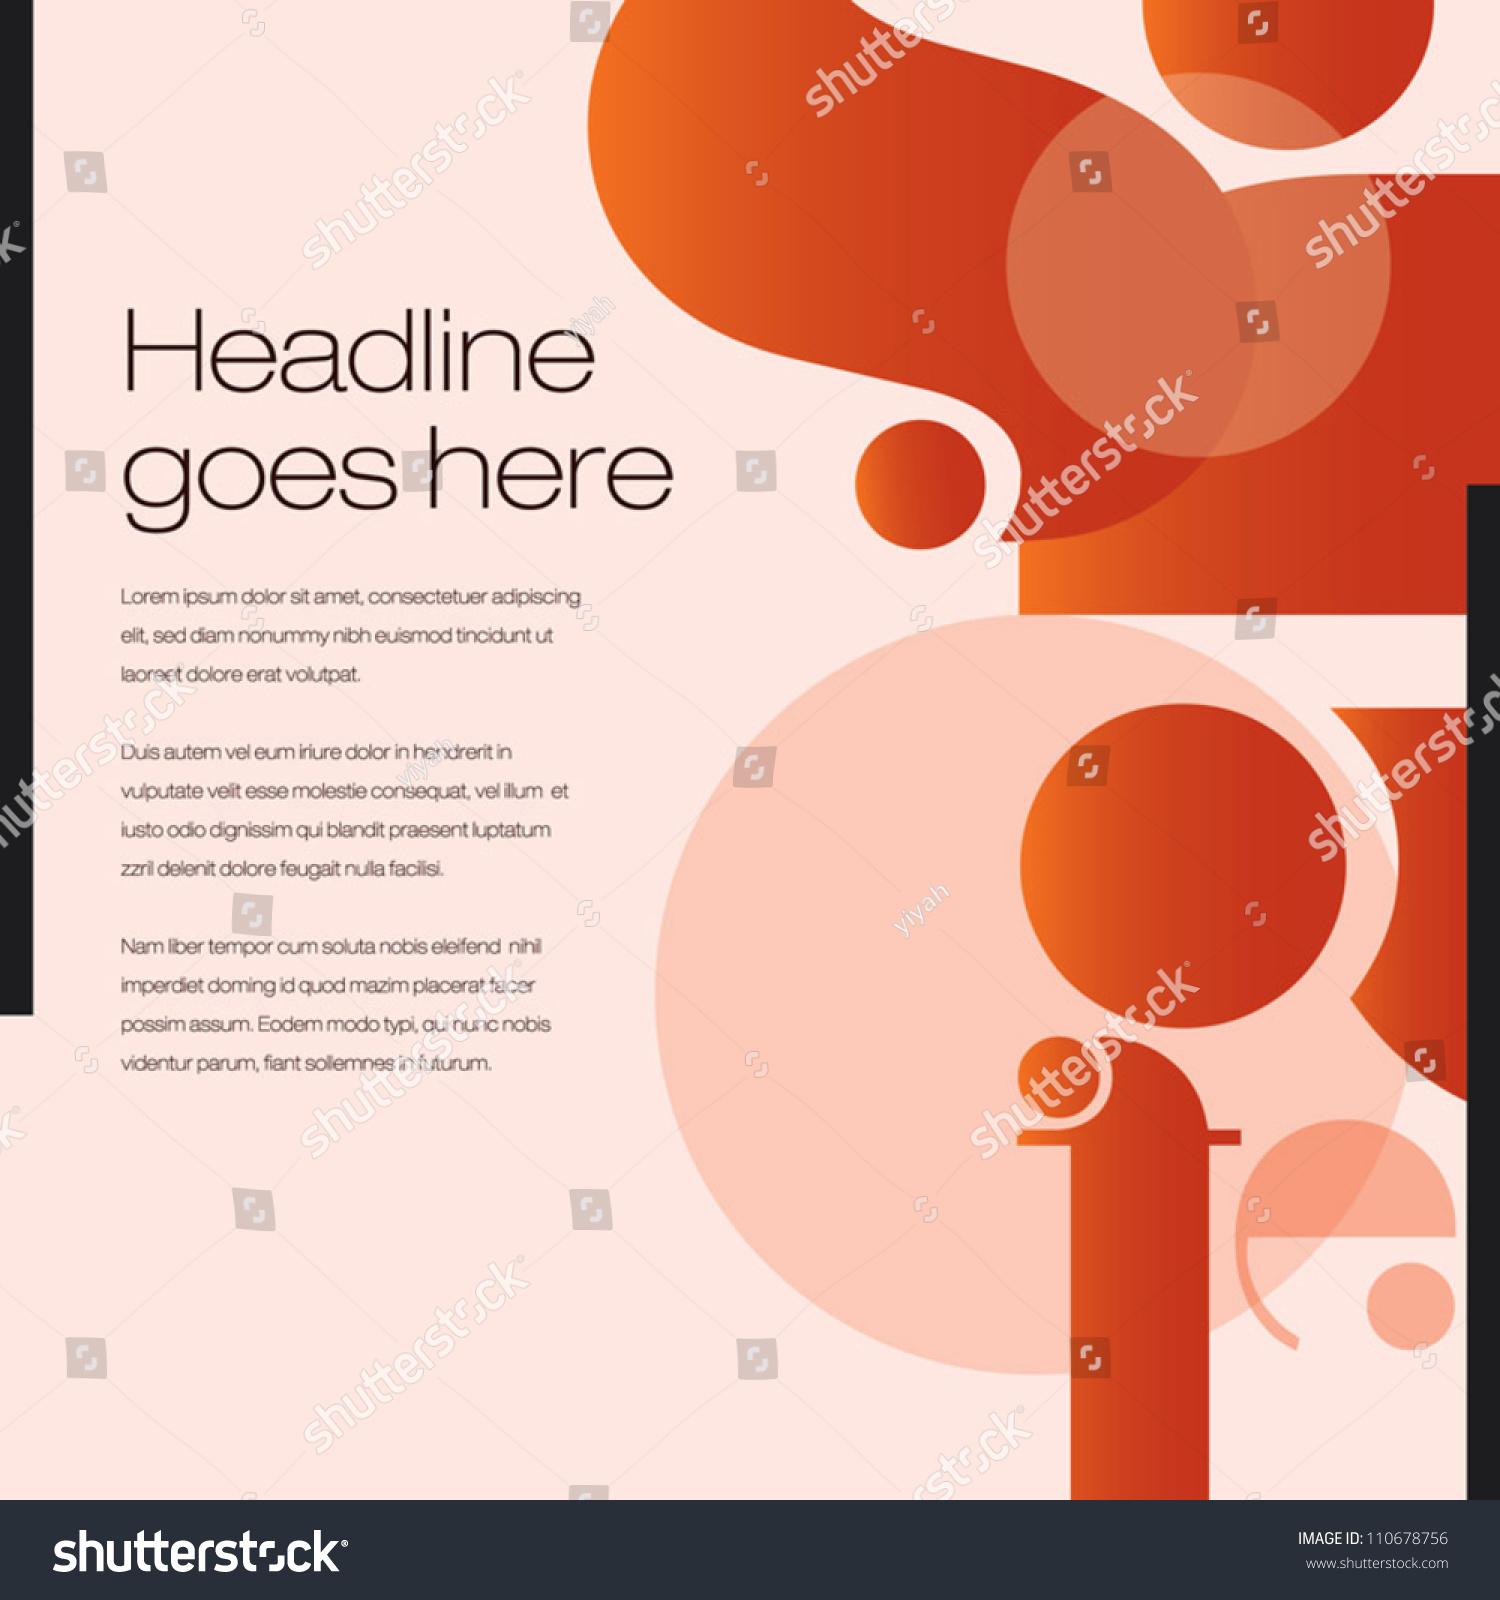 print poster background design layout graphics stock. Black Bedroom Furniture Sets. Home Design Ideas